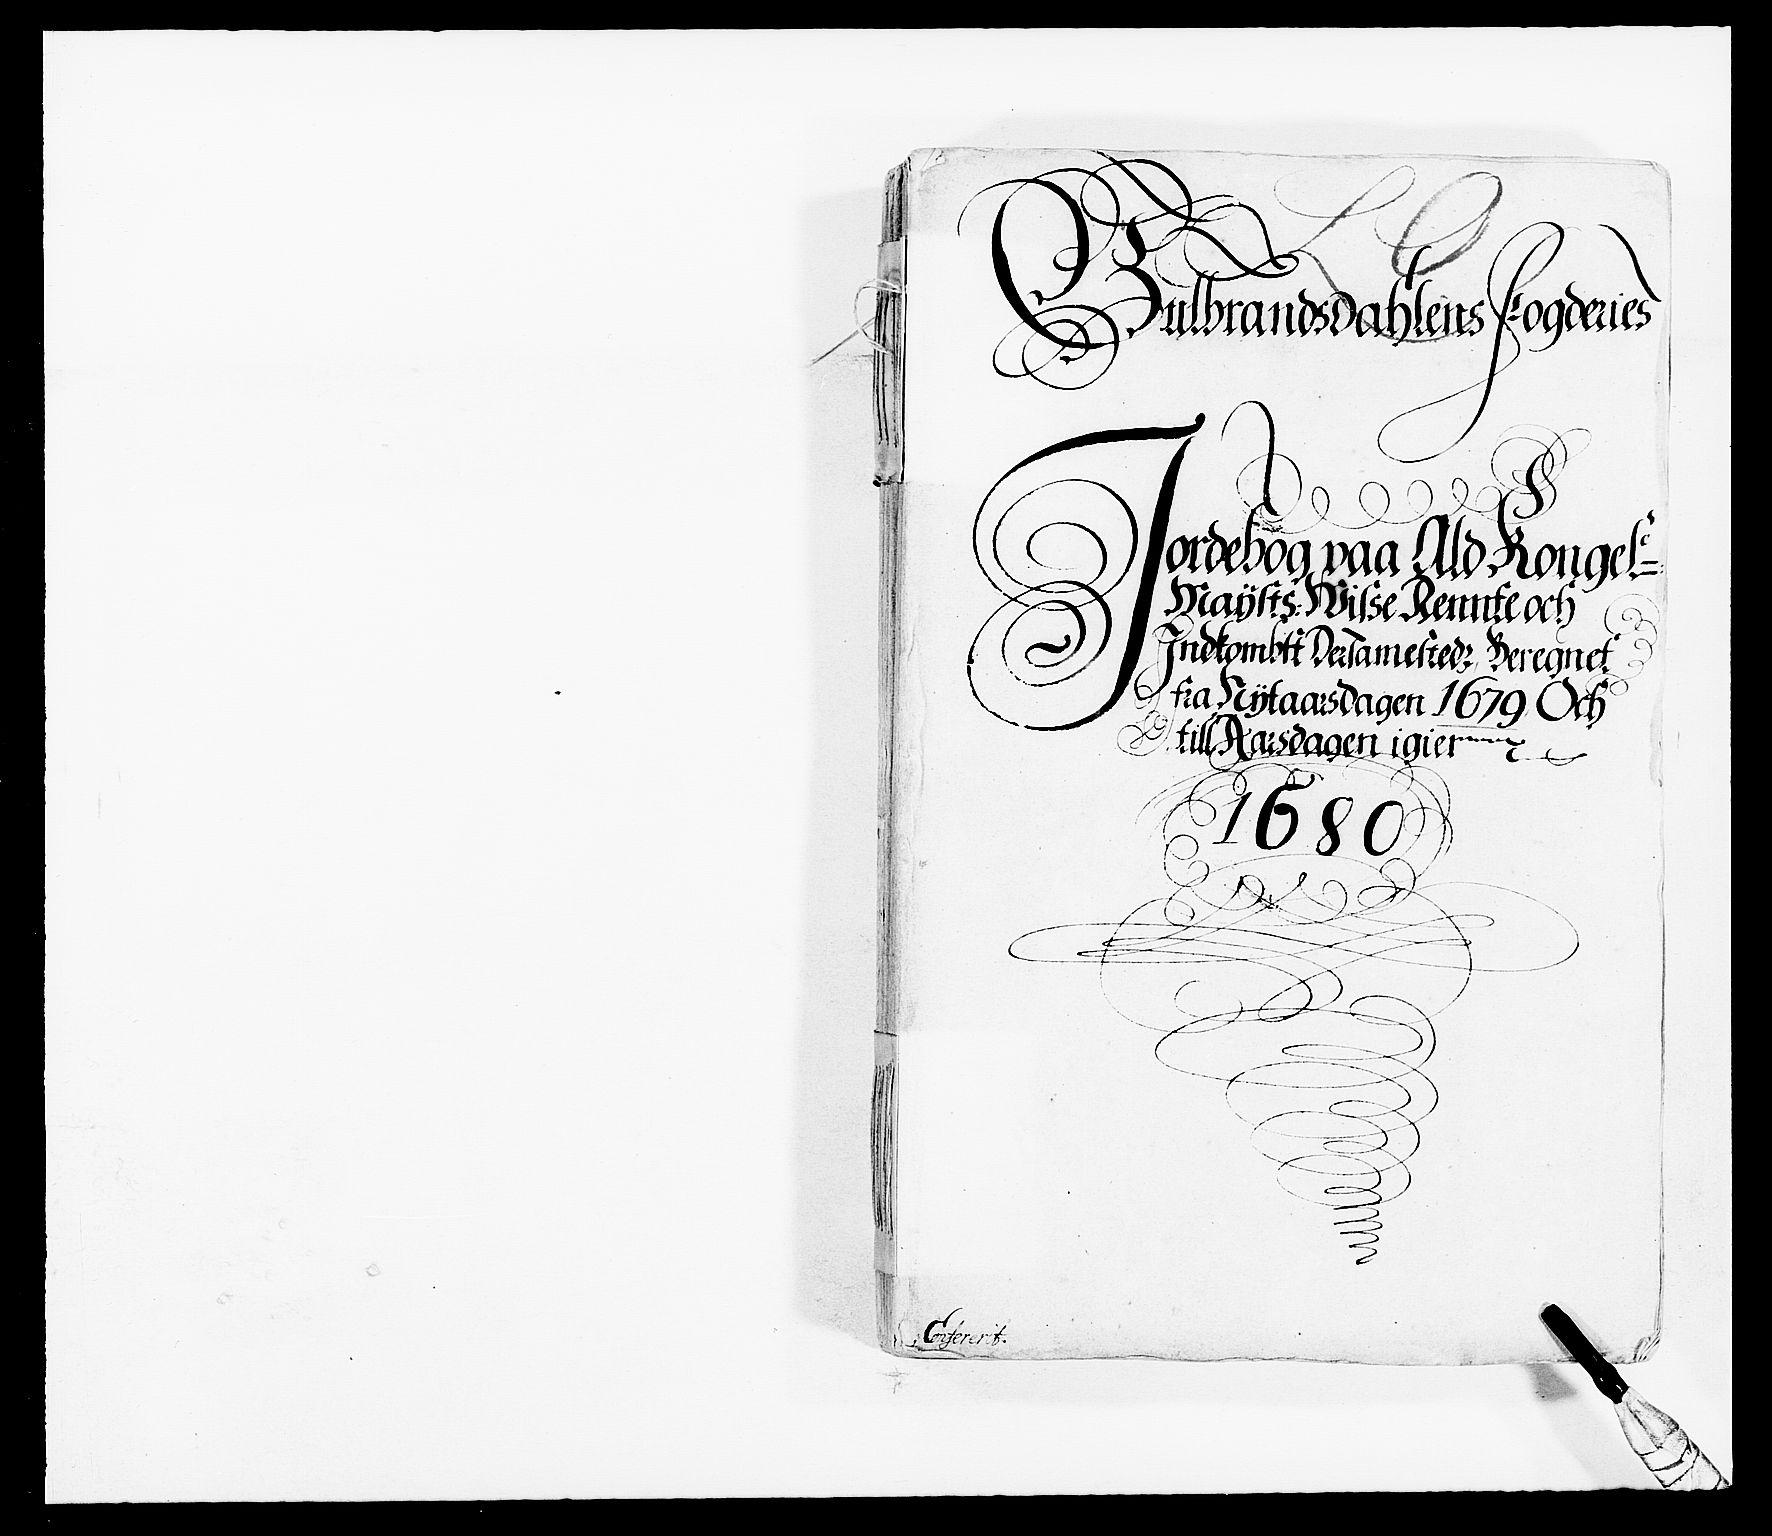 RA, Rentekammeret inntil 1814, Reviderte regnskaper, Fogderegnskap, R17/L1153: Fogderegnskap Gudbrandsdal, 1678-1679, s. 30